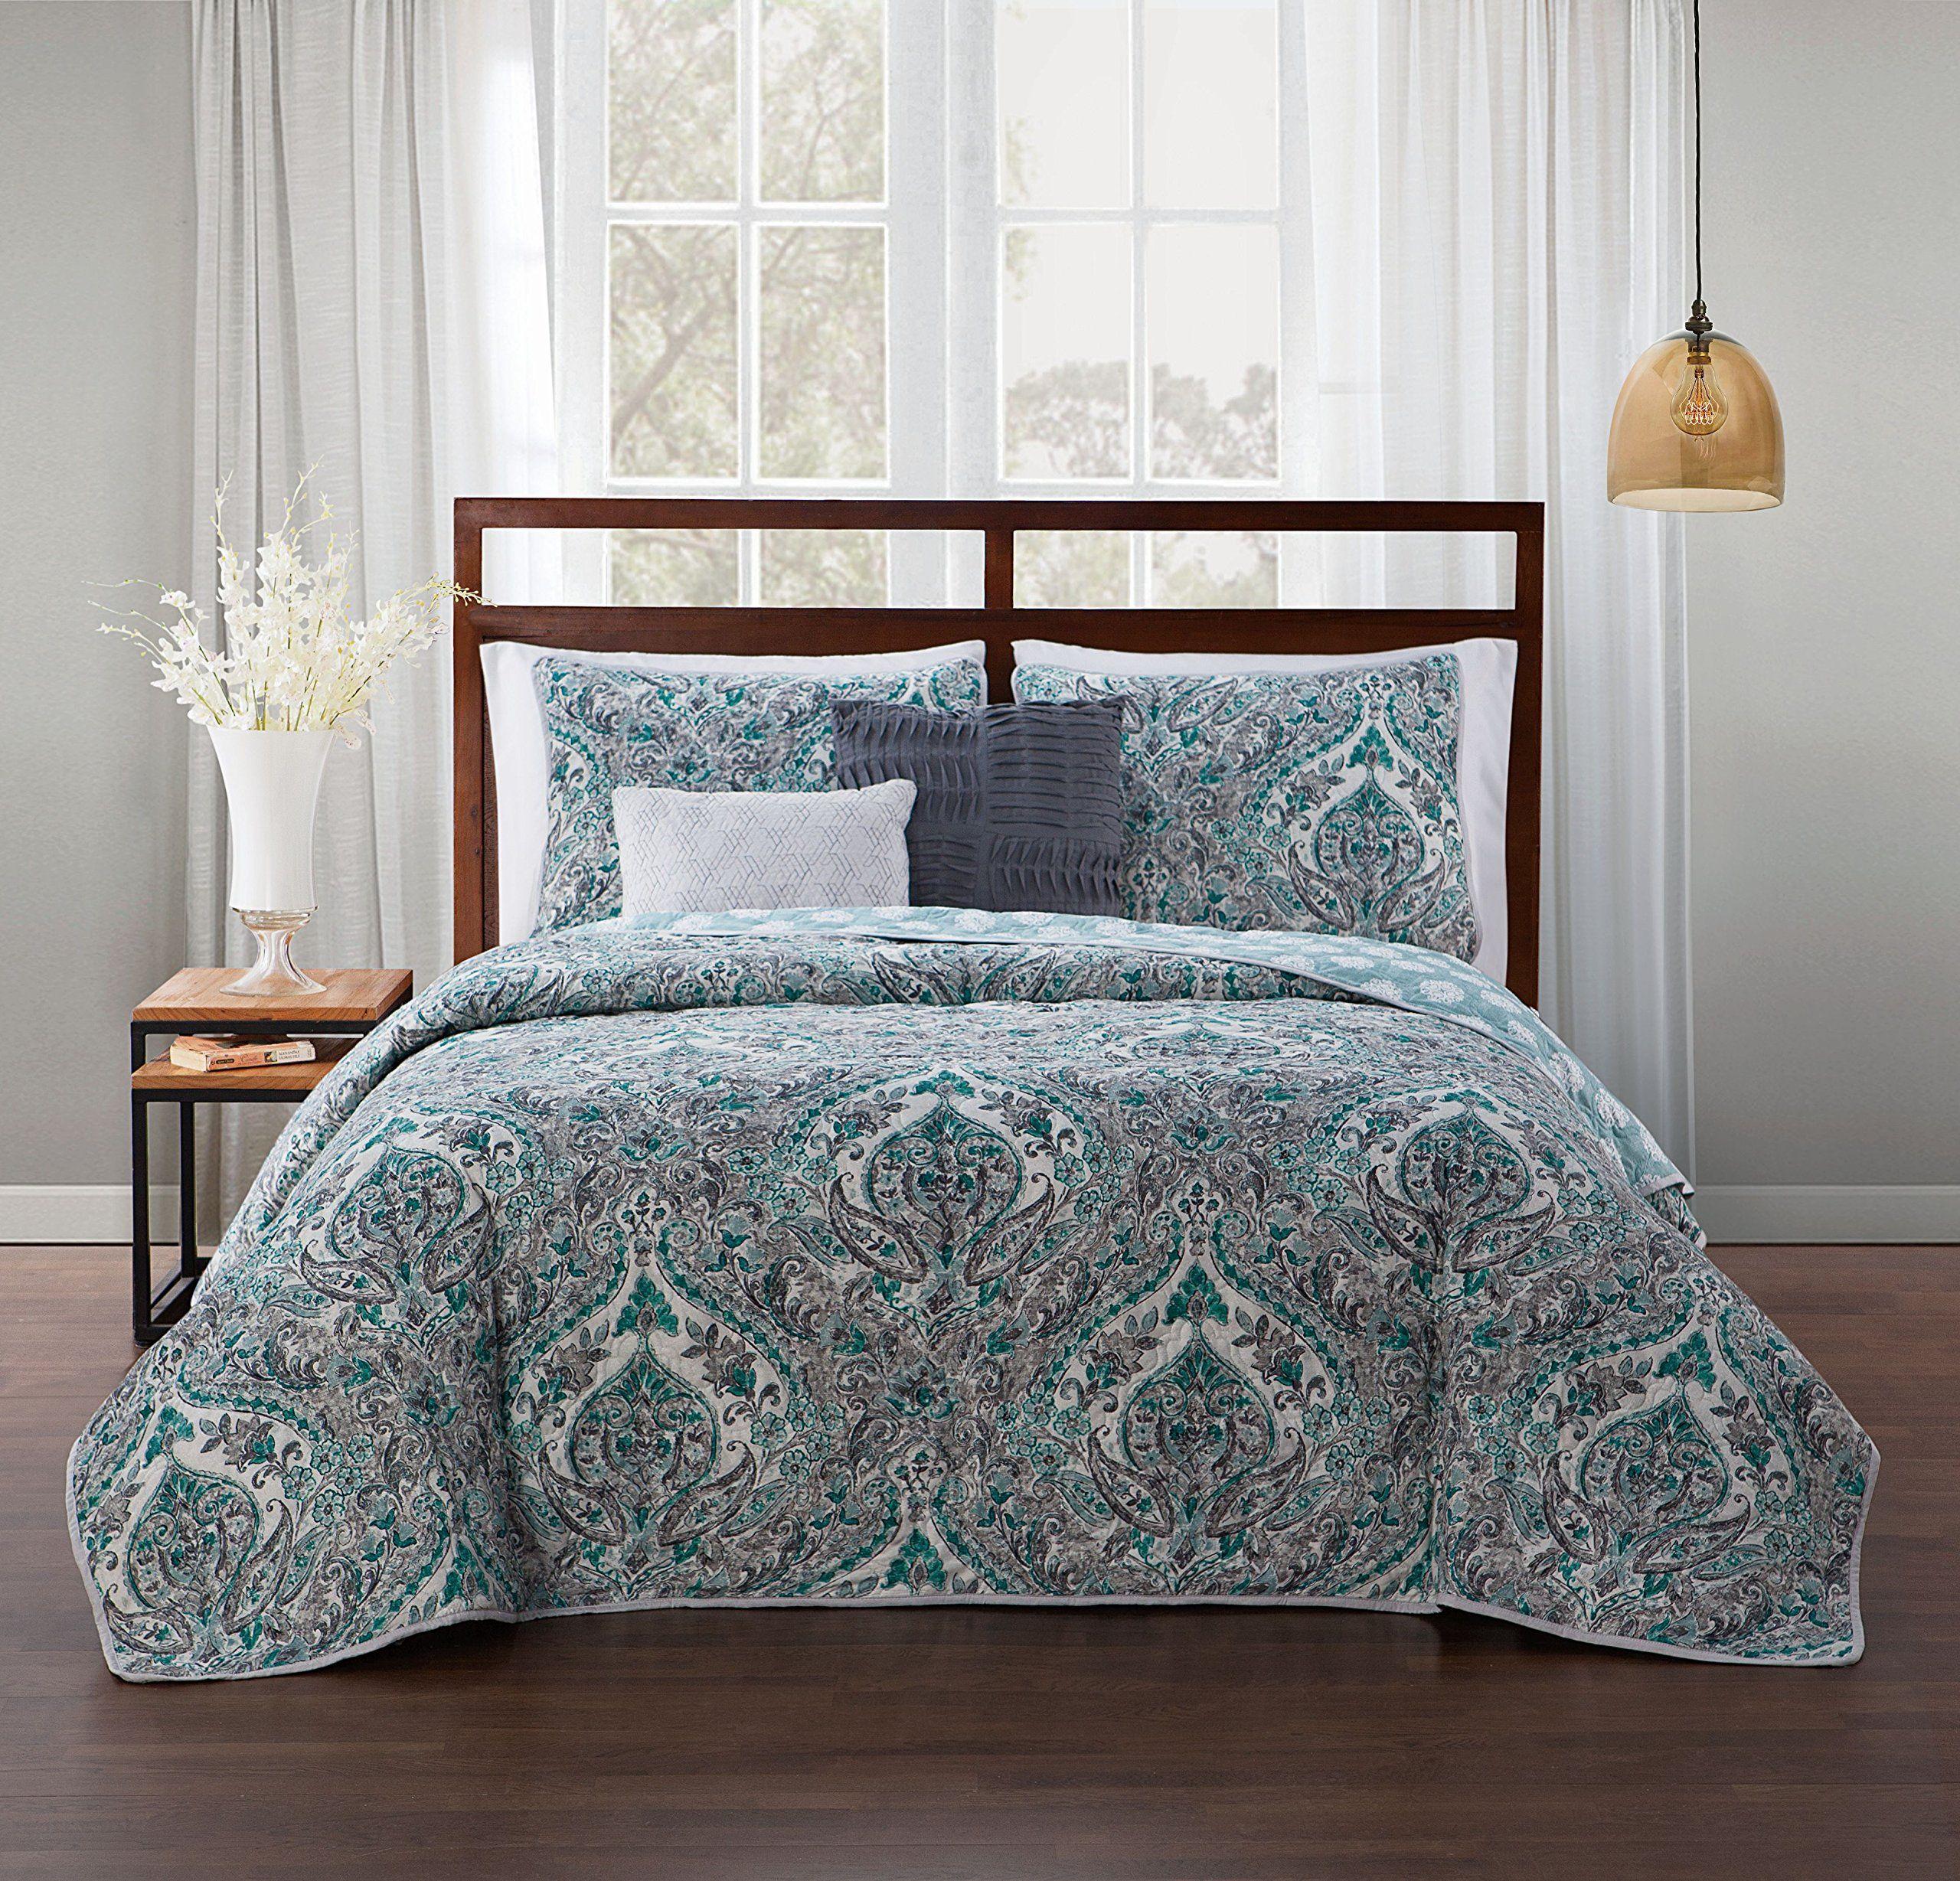 avondale manor hali 5piece quilt set queen teal grey click image rh pinterest com